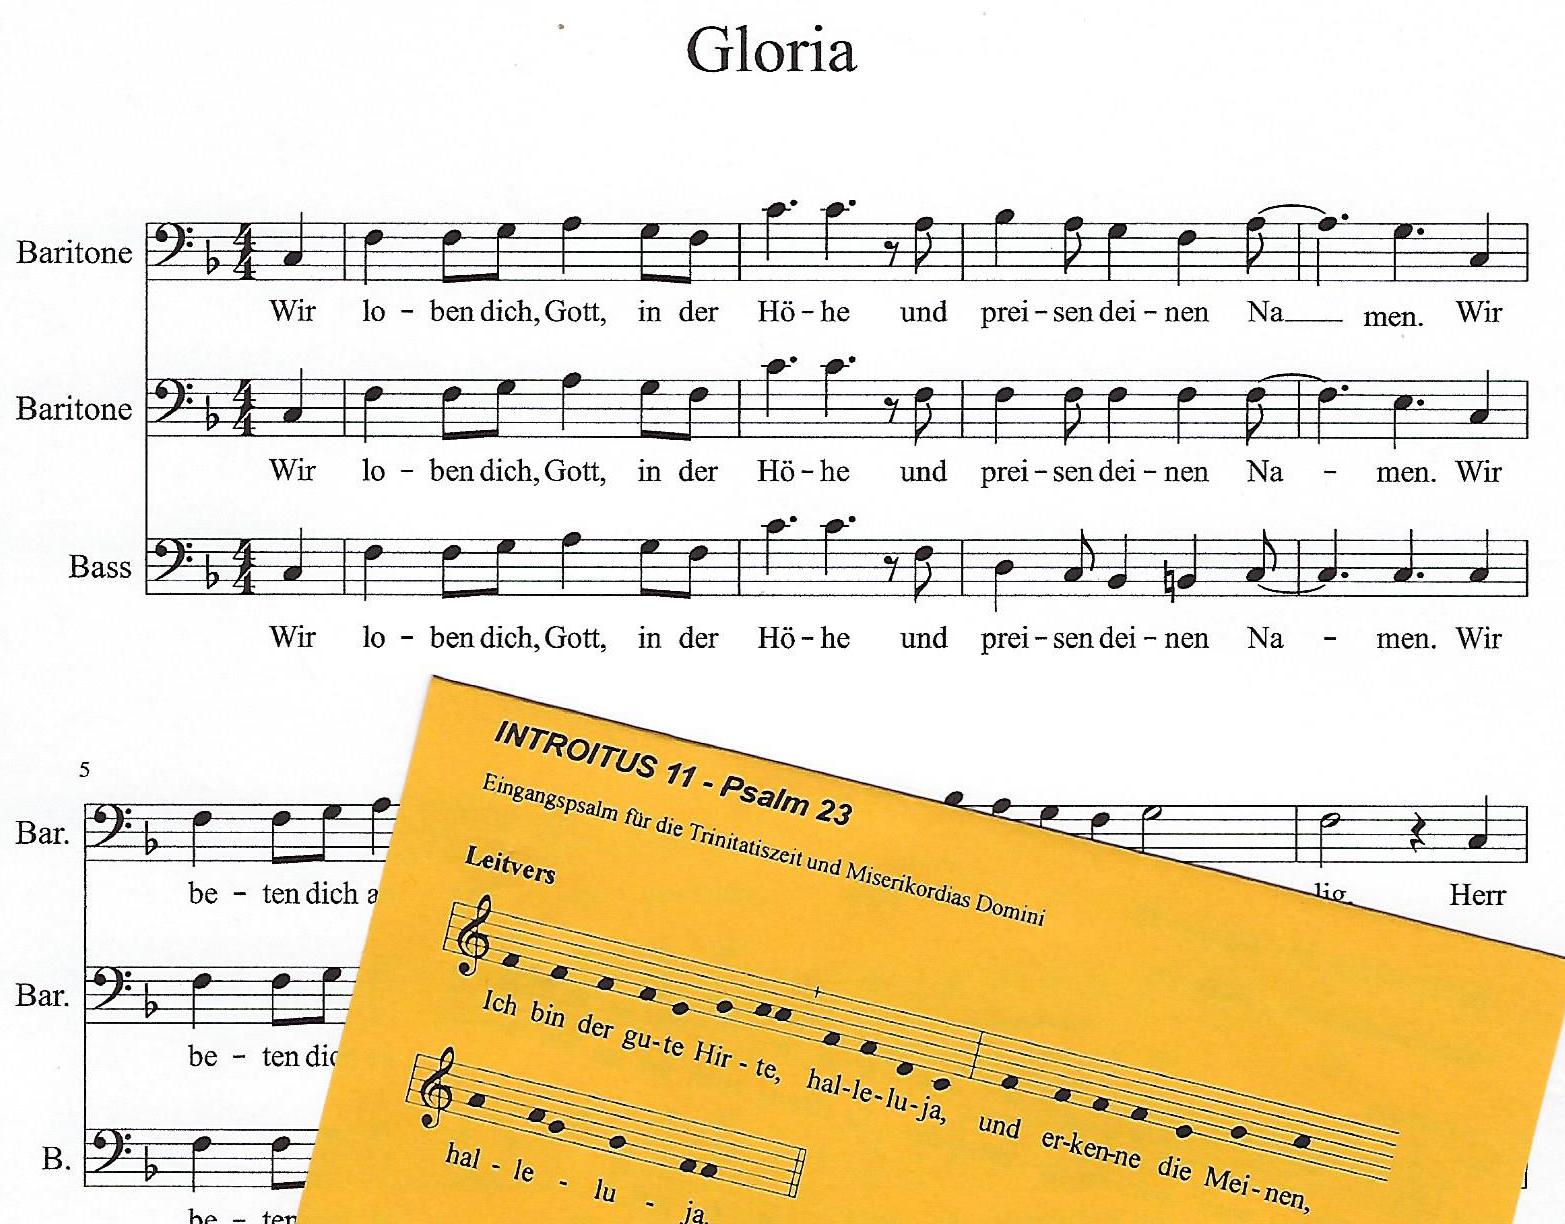 2009_GemlHol_Noten2_Liturgischer_Chor